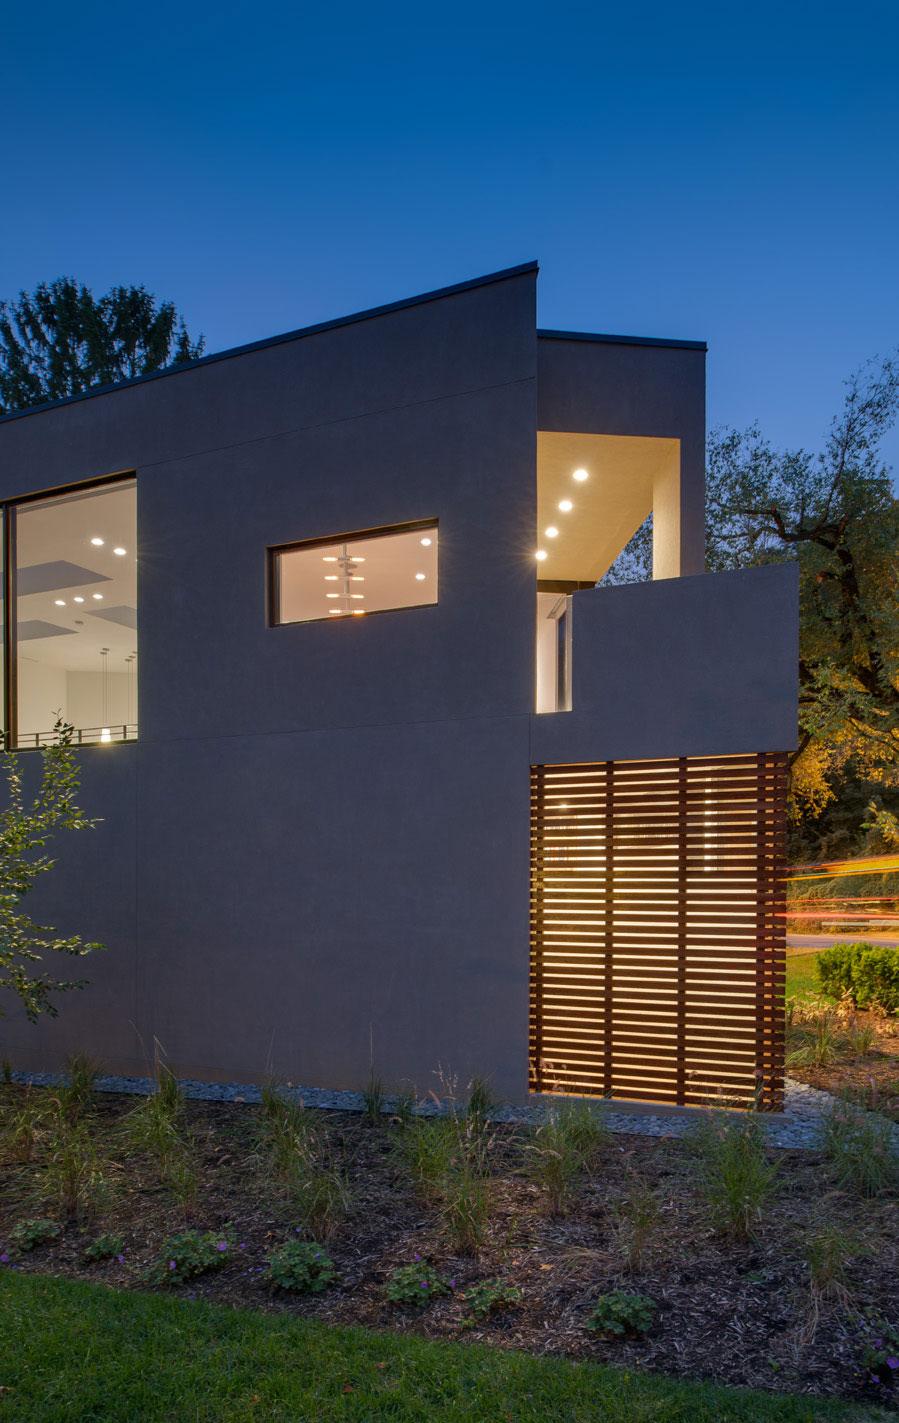 Komai residence by robert m gurney architect homedezen - Pavillon residentiel moderne gurney architecte ...